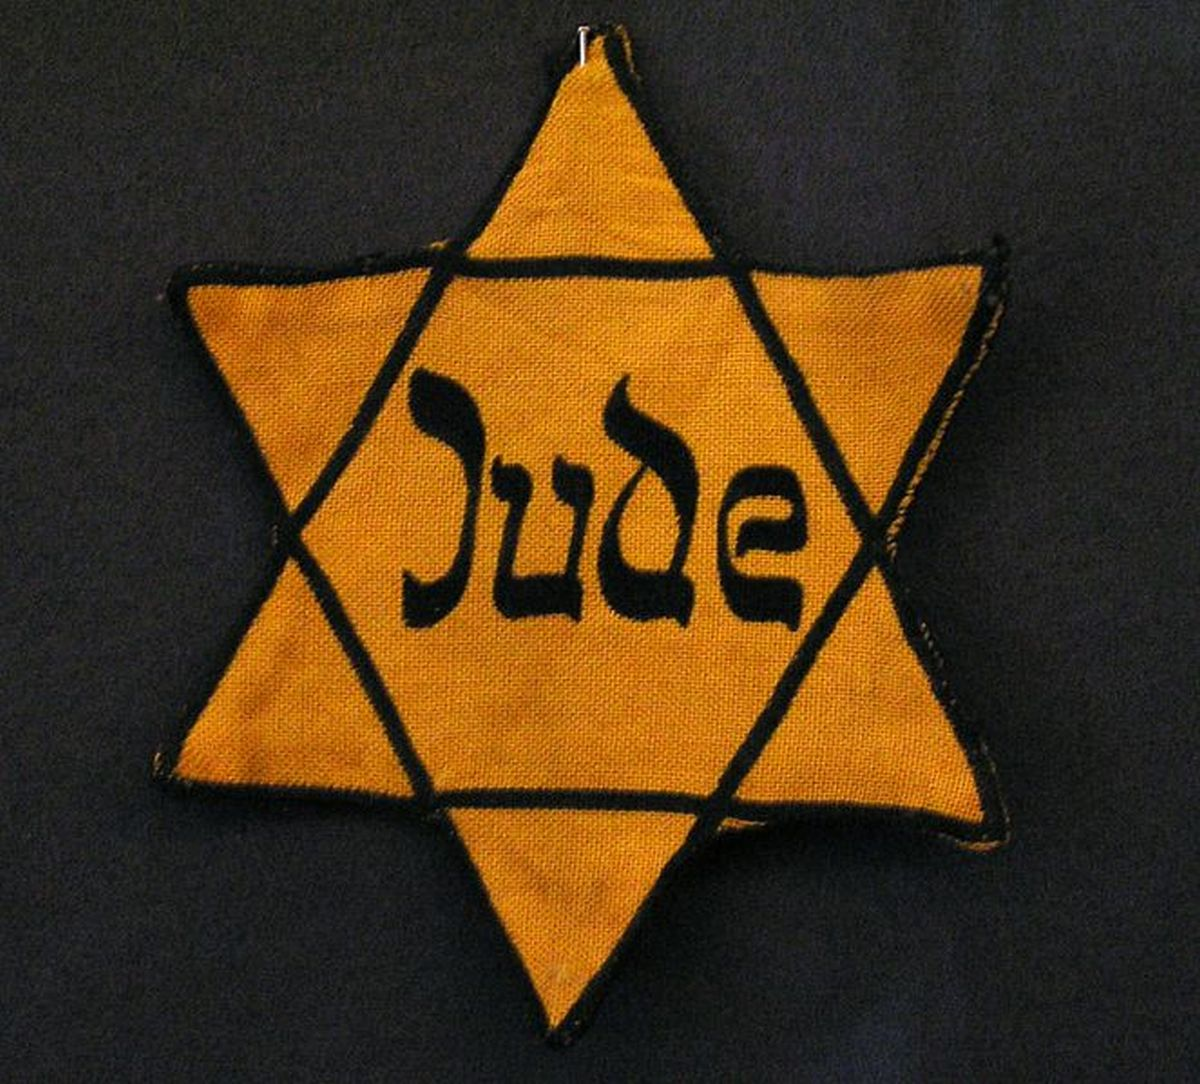 jude jews ile ilgili görsel sonucu